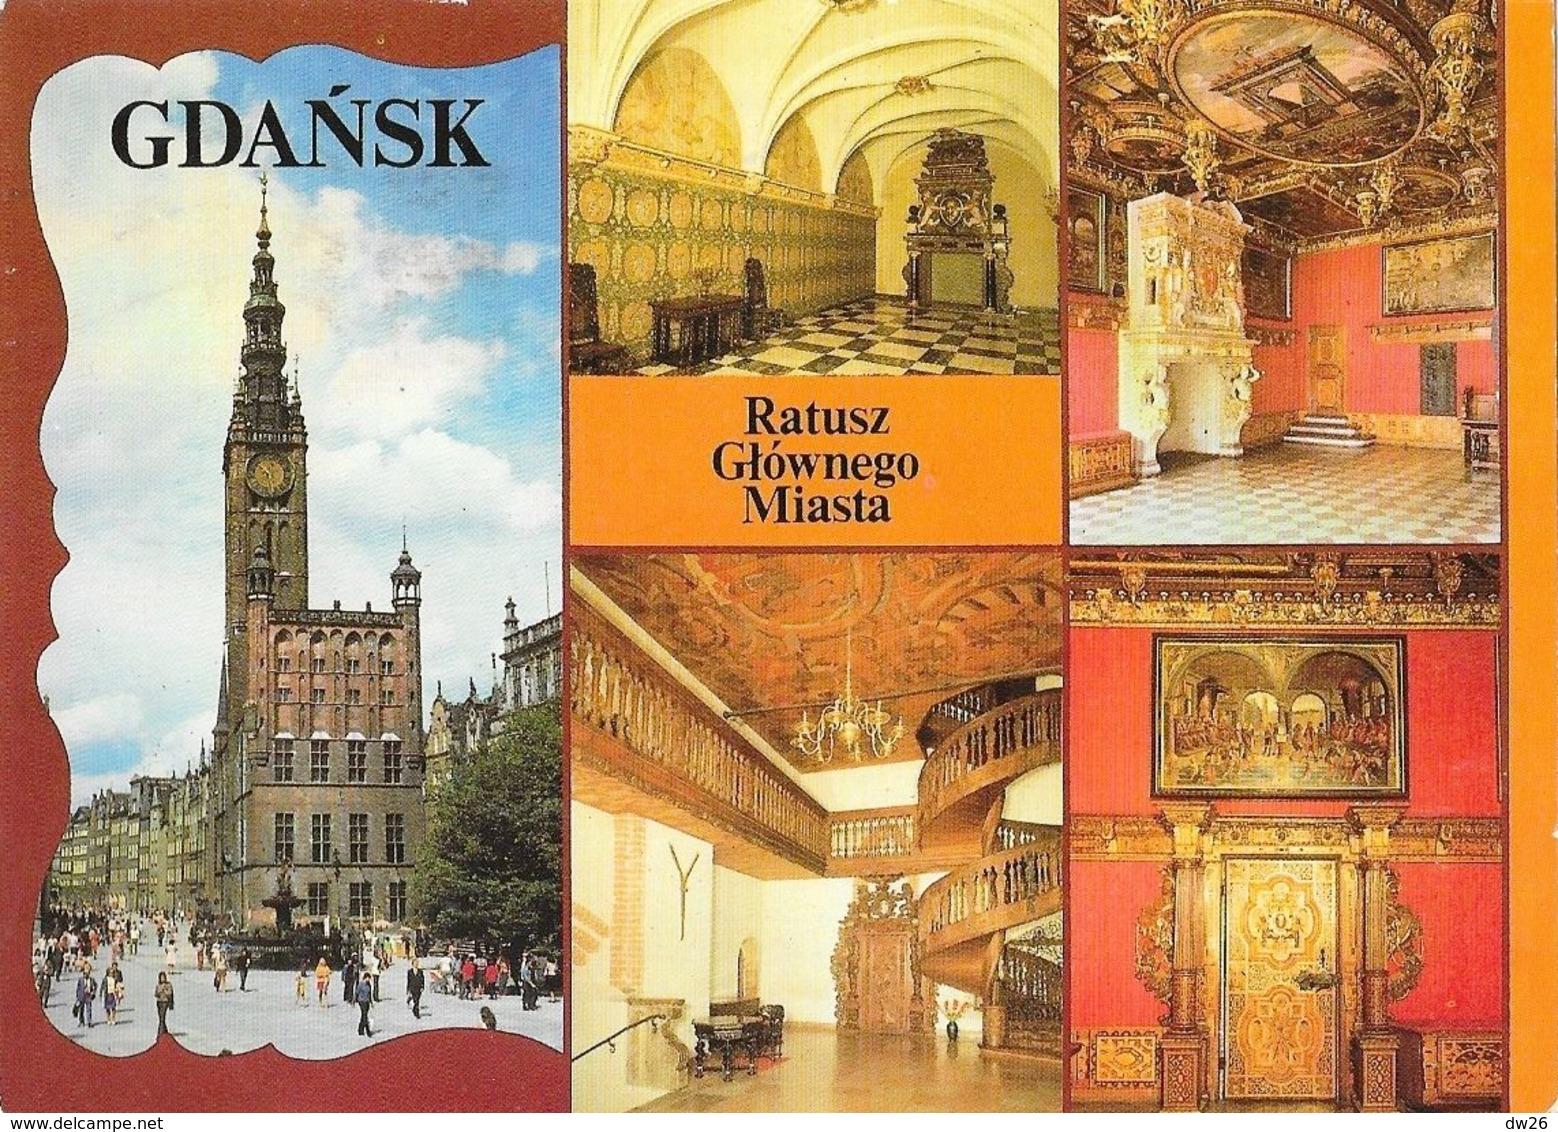 Gdansk (Danzig, Pologne) - Multivues: Ratusz, Glownego, Miasta - Pologne